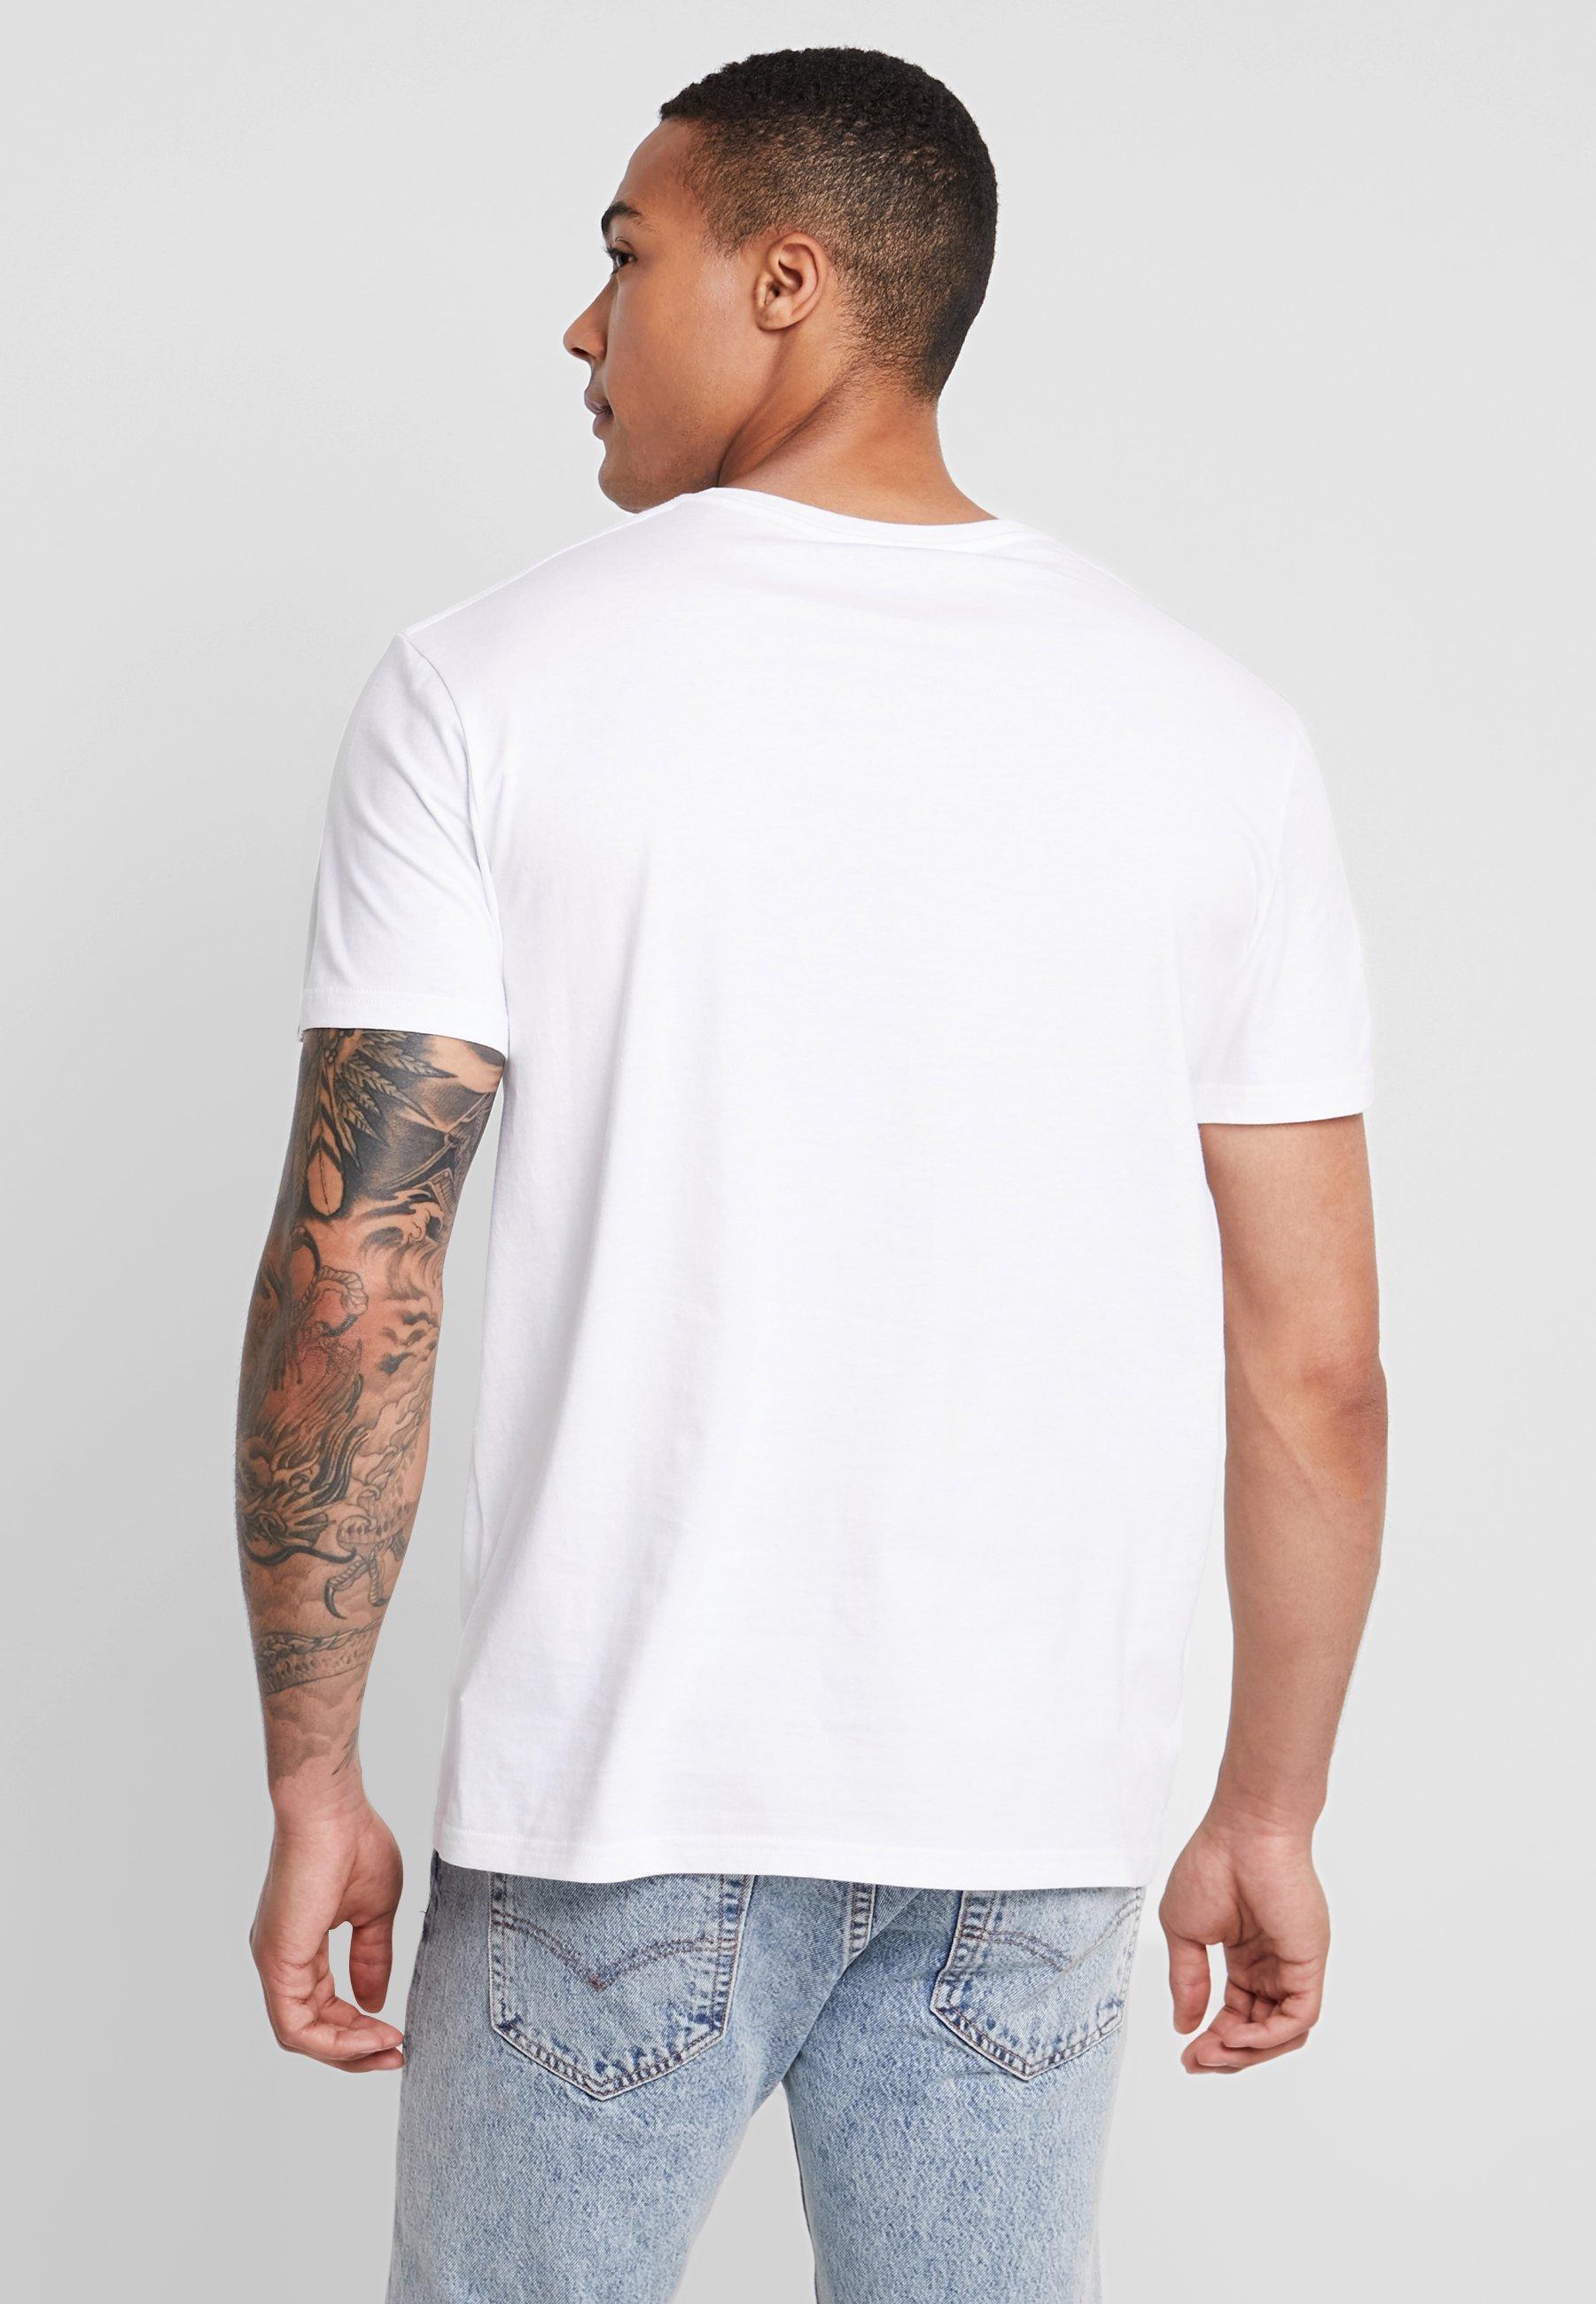 Quiksilver shirt TeesT White Imprimé Getbuzzyss tshrCdQ